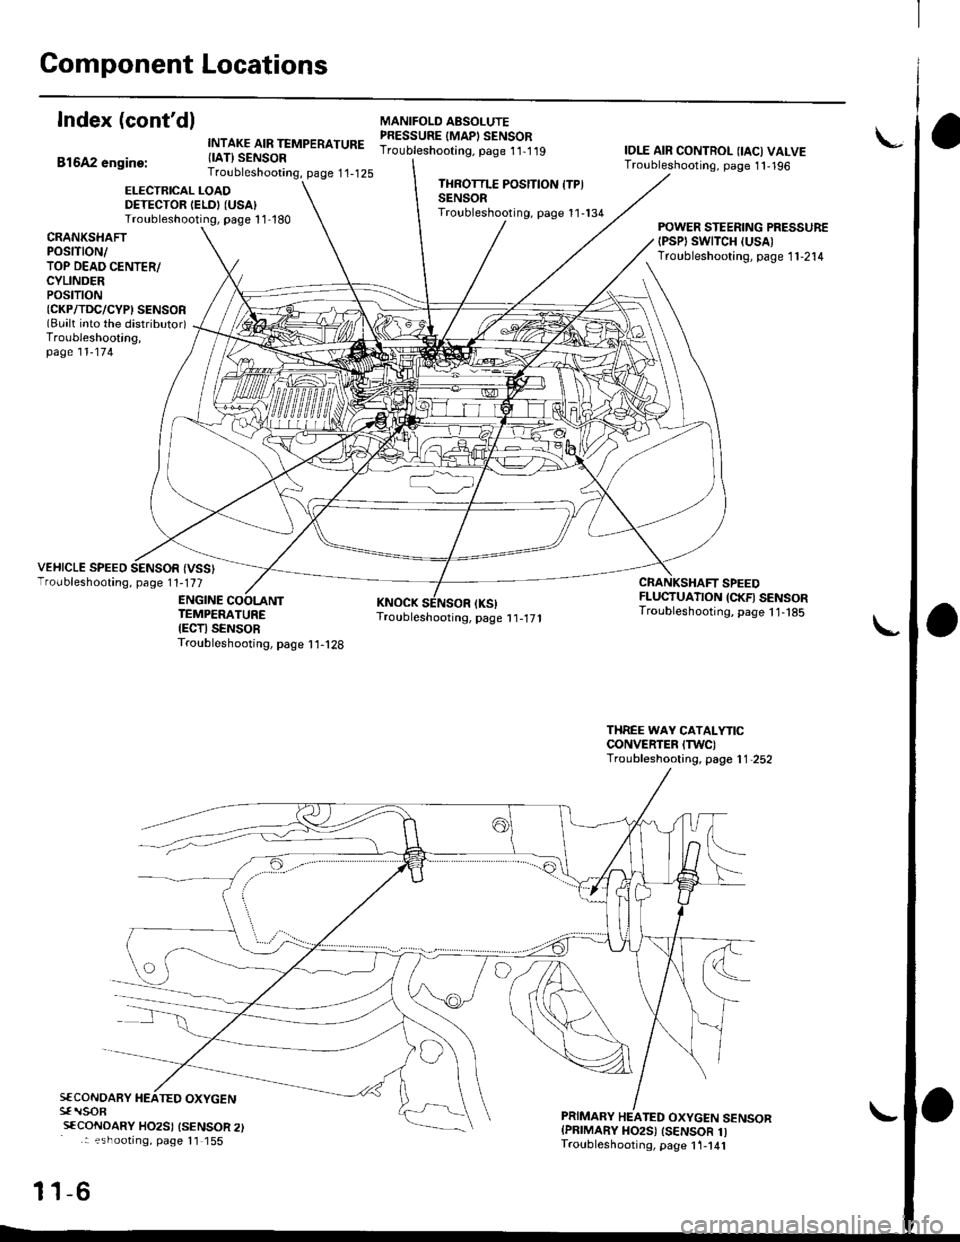 1989 ford festiva wiring diagrams online repair manuals